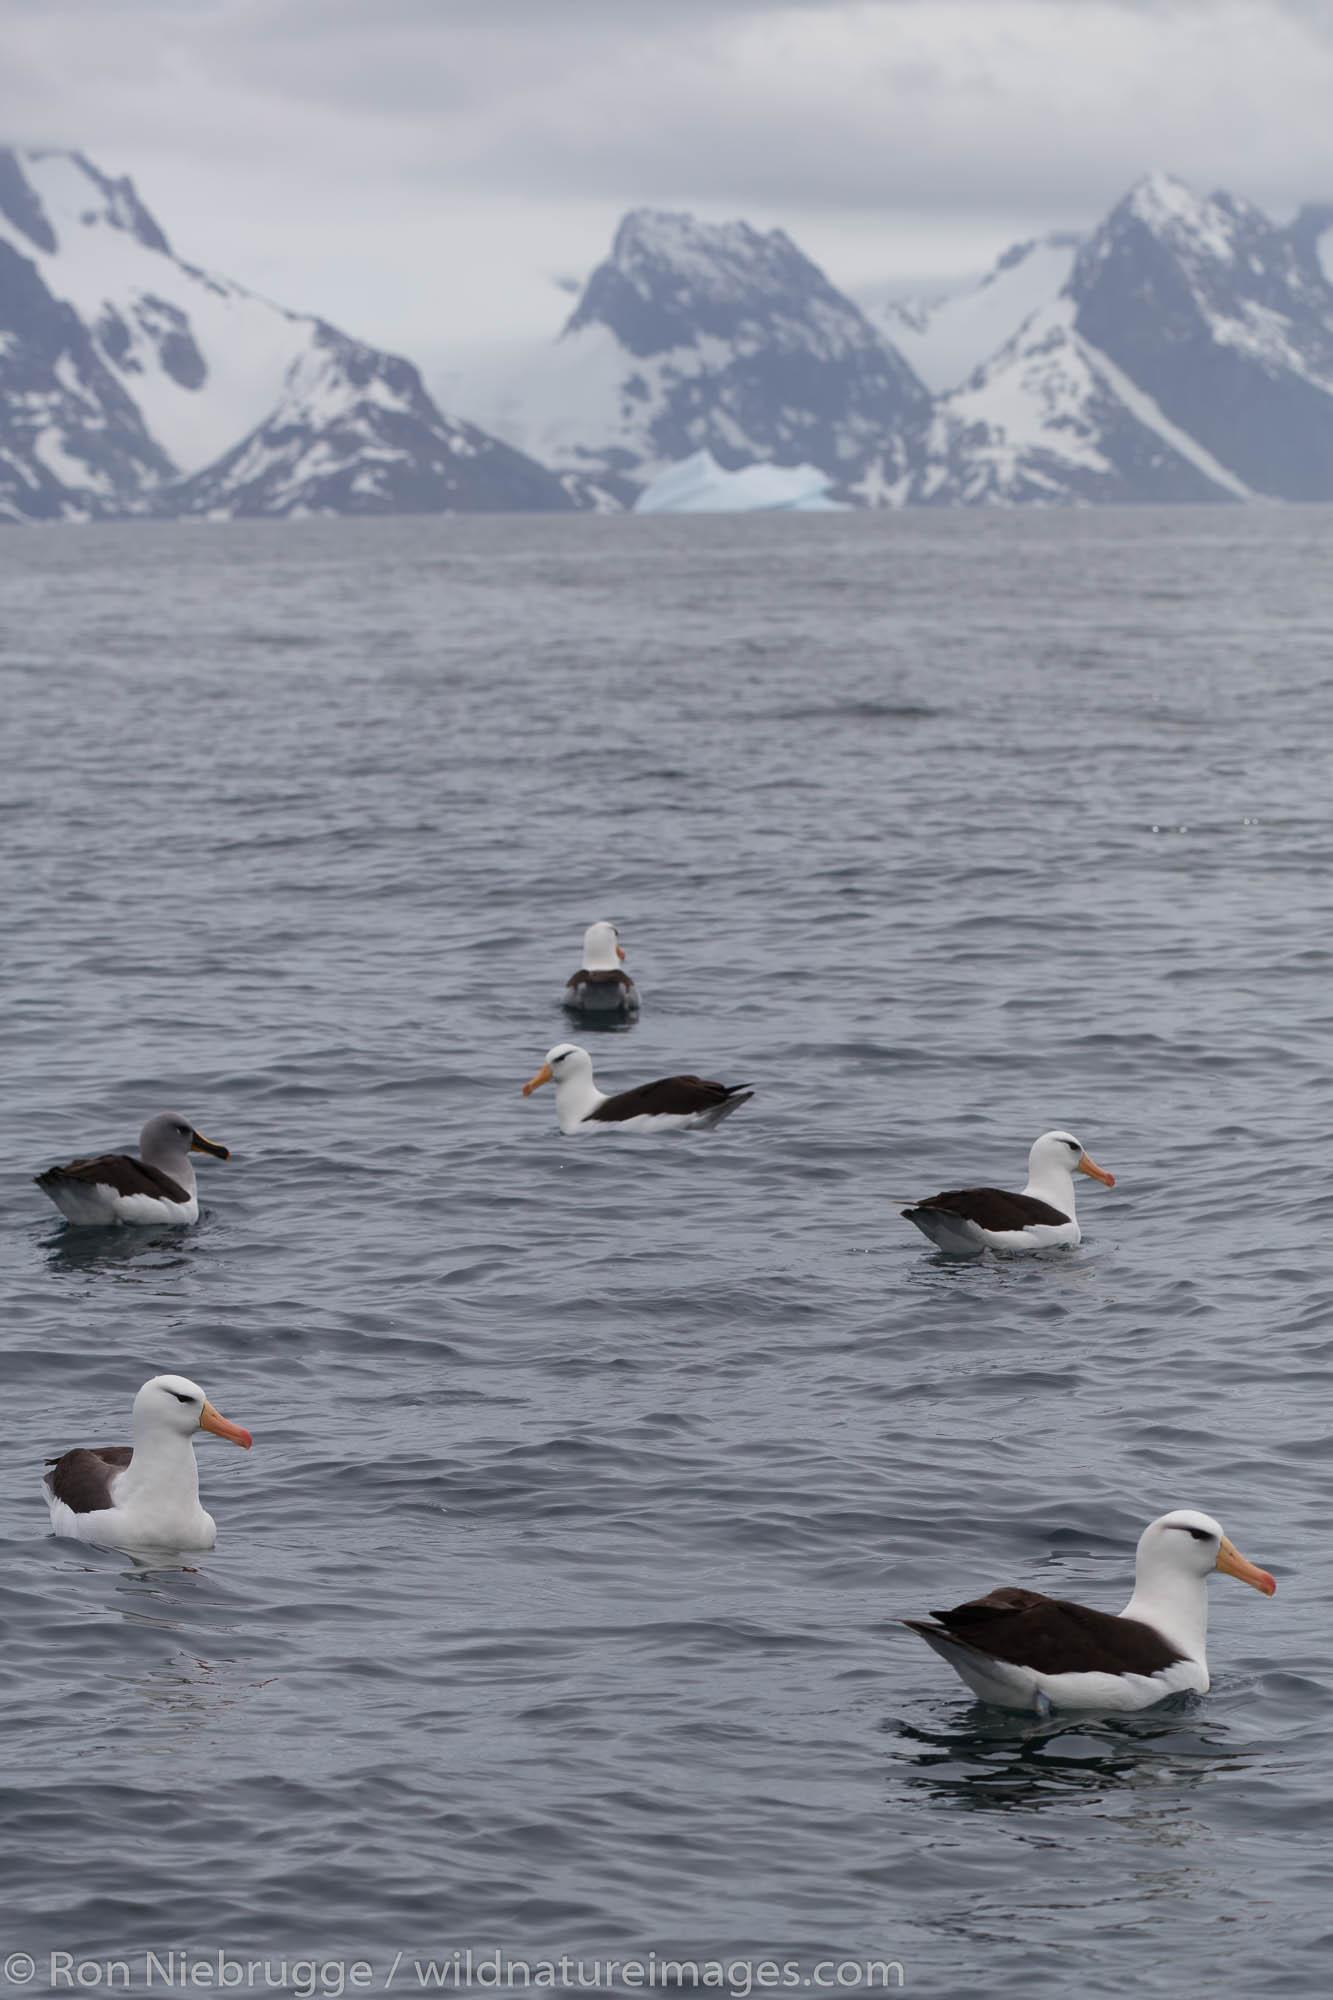 Black-browed albatross (Thalassarche melanophrys), Cooper Bay, South Georgia, Antarctica.